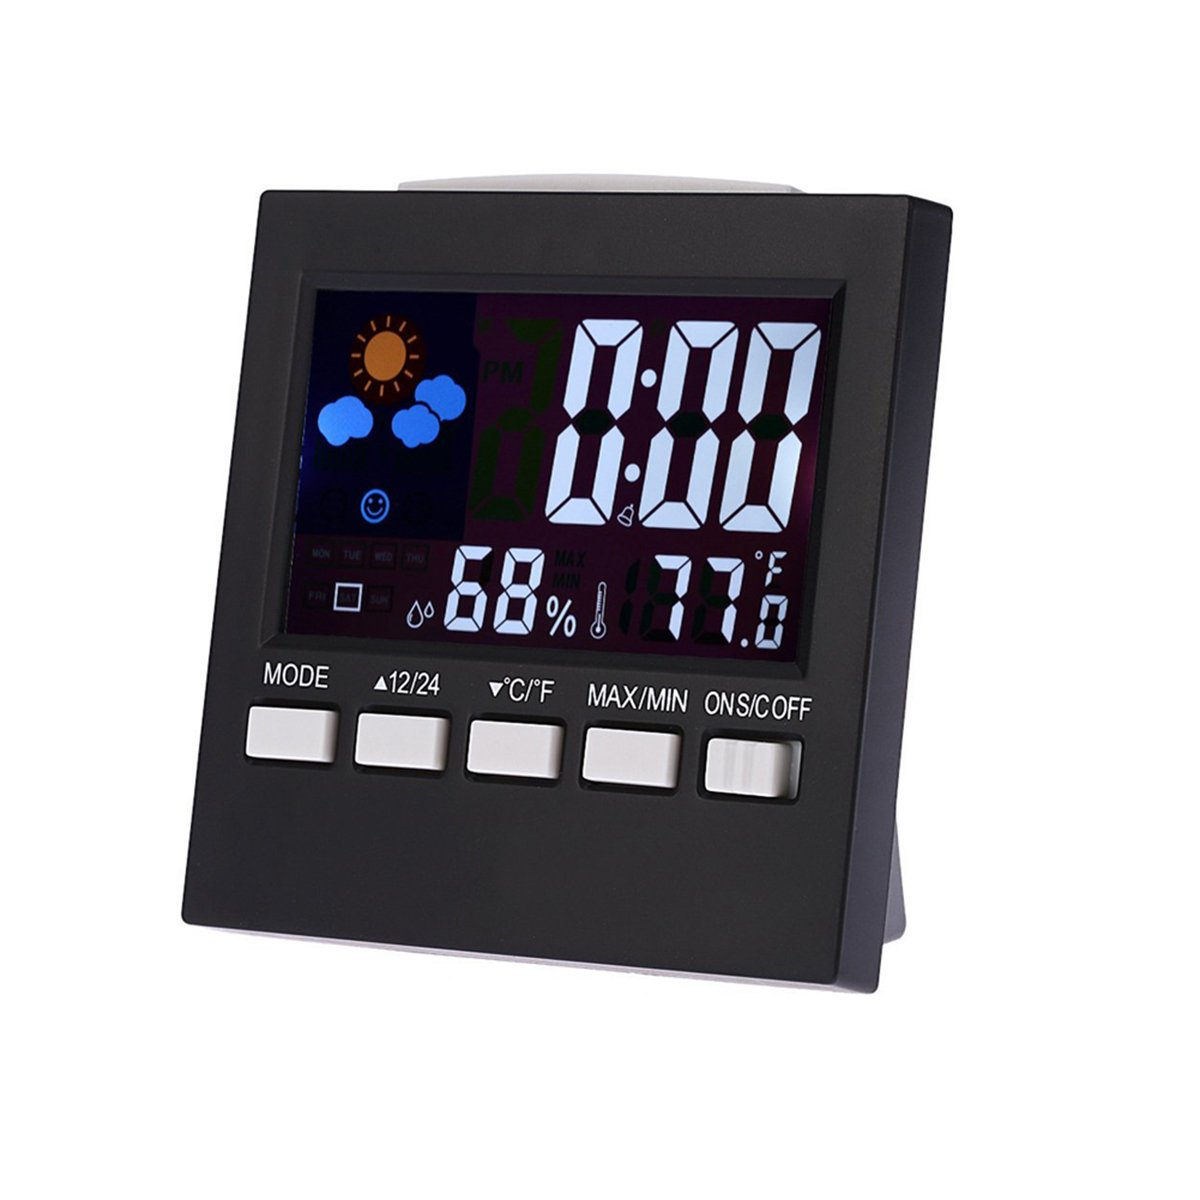 Enjoy Best Time Digital Weather Forecast Thermometer Hygrometer Clocks For Household-Mini Snooze Light Table Alarm Clocks For Traveling(Black)